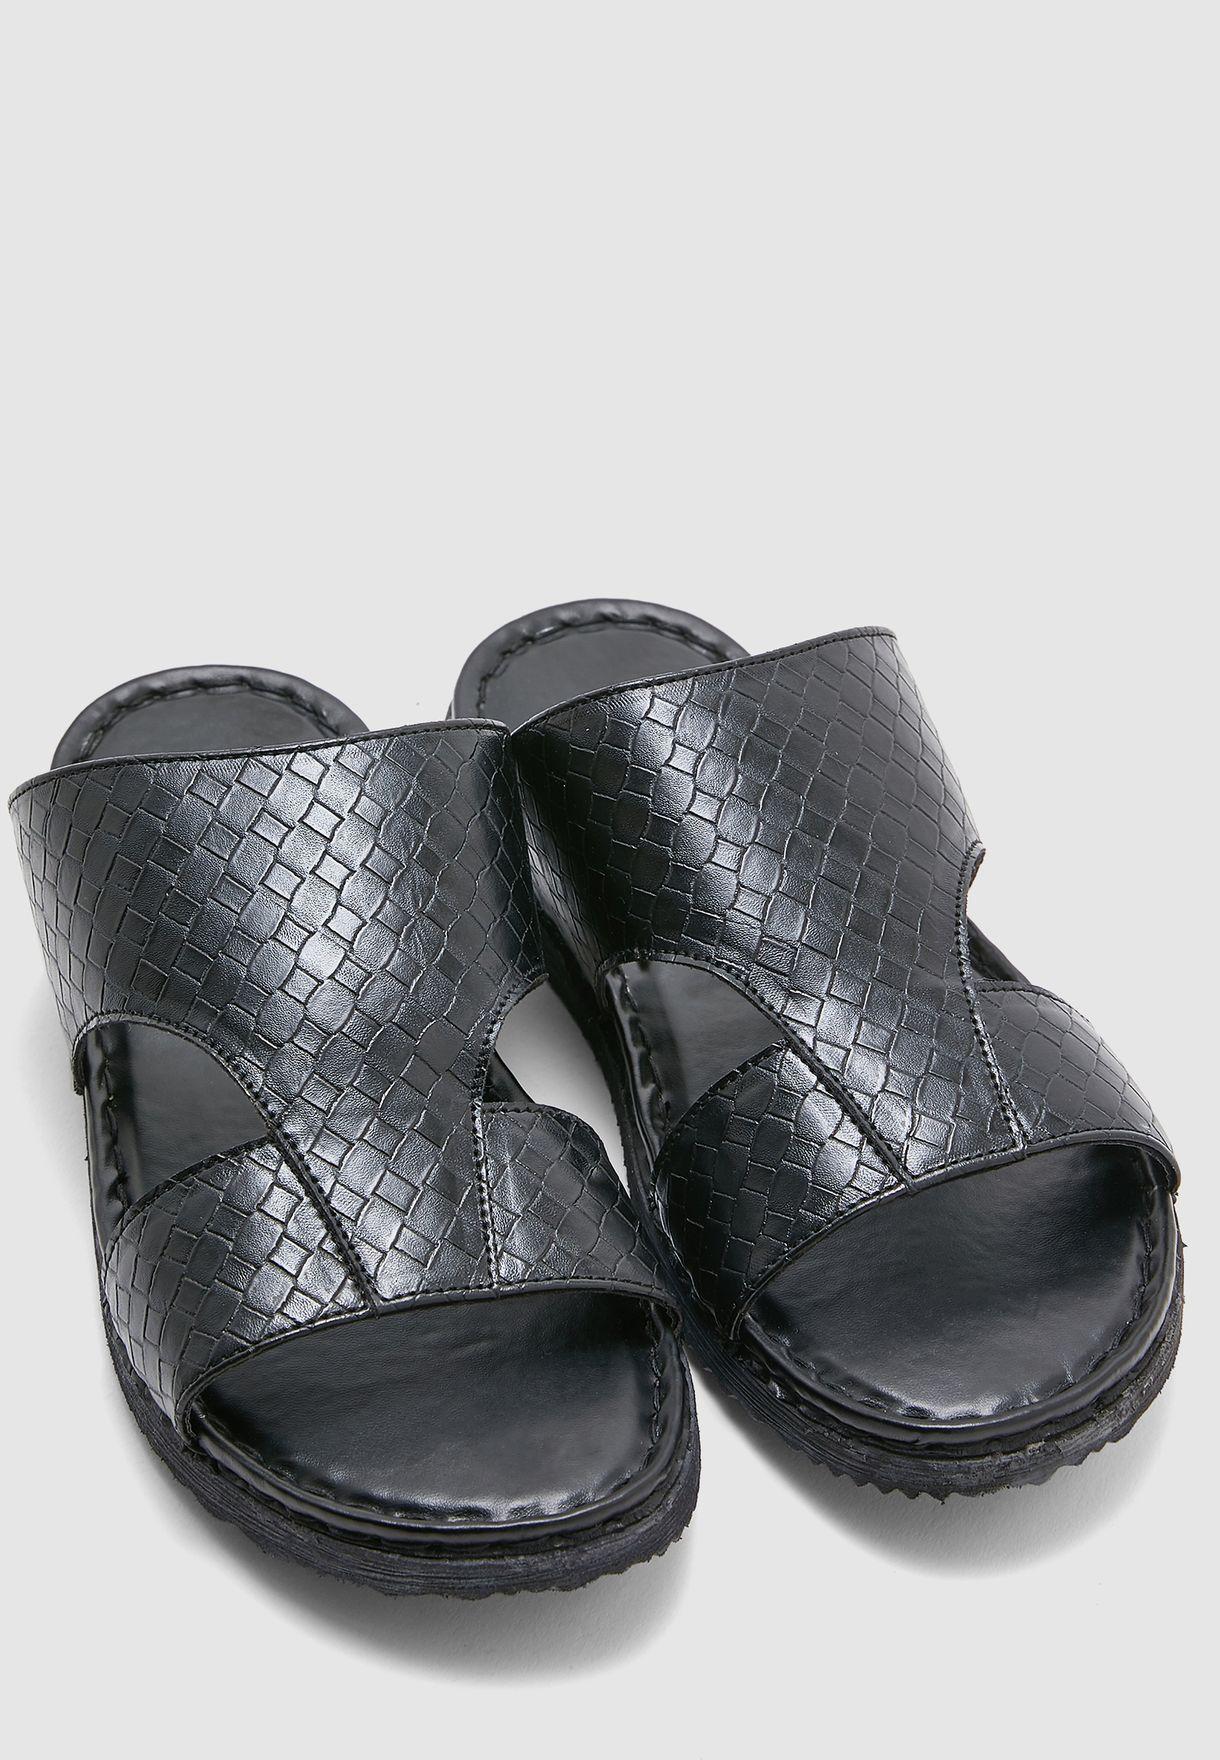 Raha Arabic Sandals